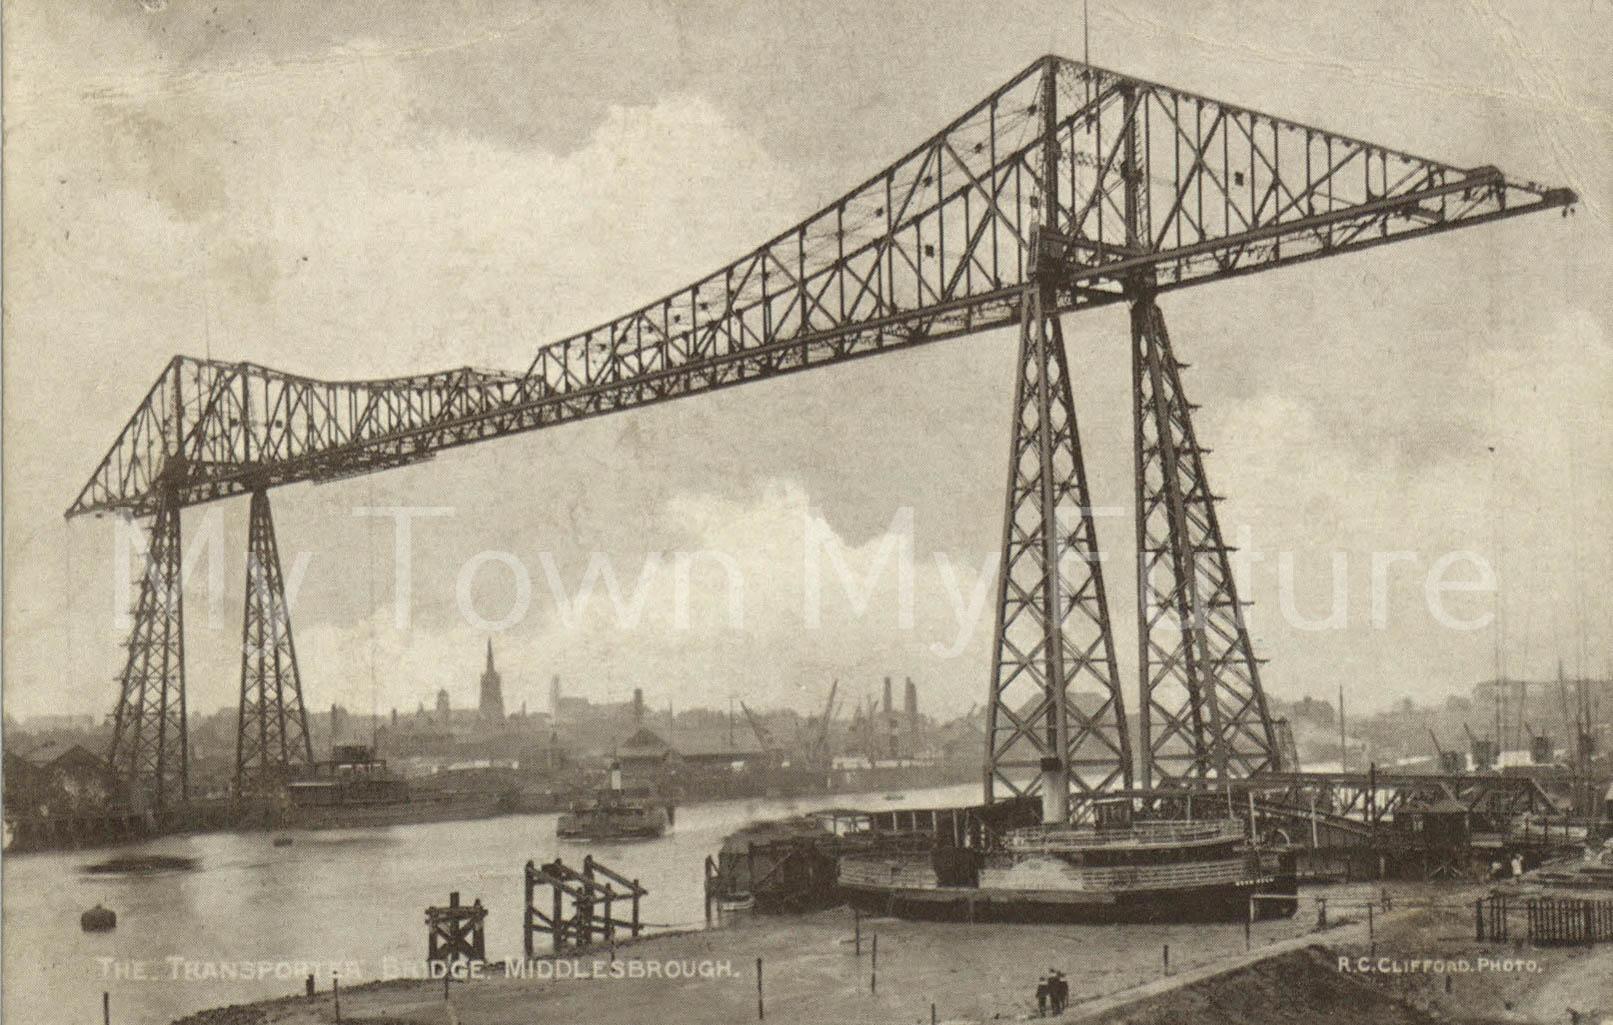 Transporter Bridge Postcard Postmarked 10th July 1912